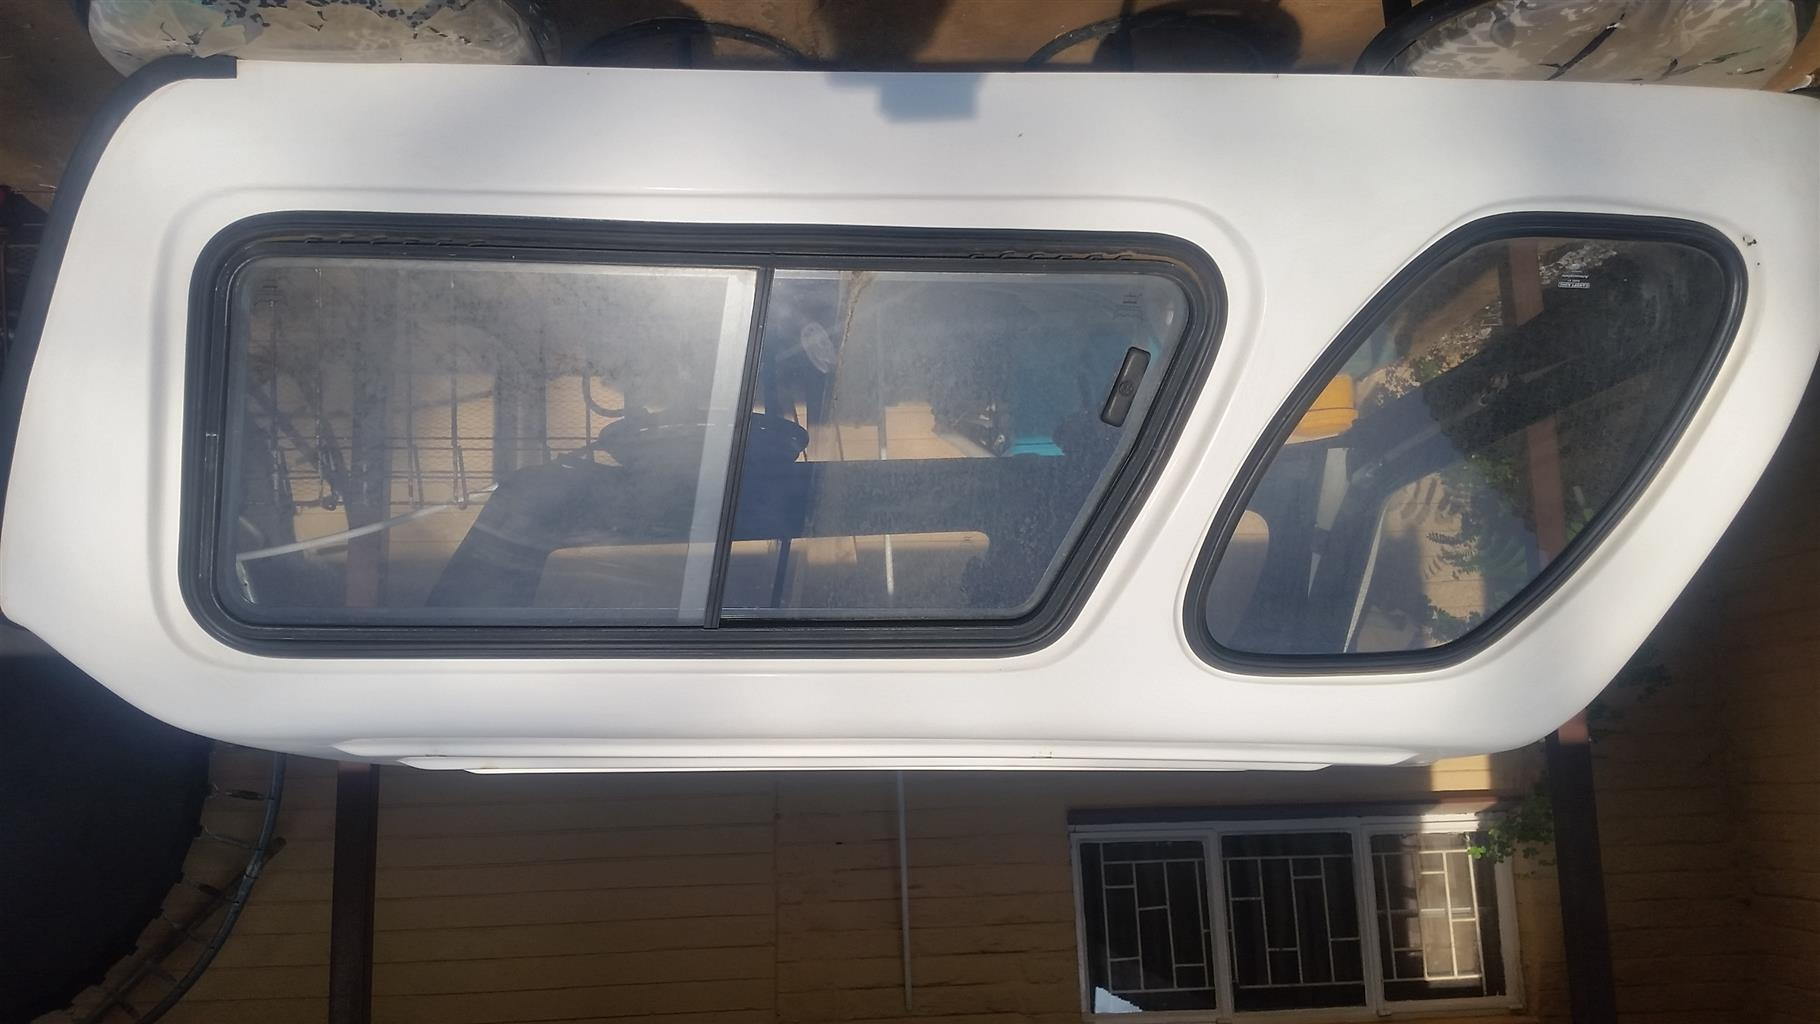 MP 200 Nissan conopy